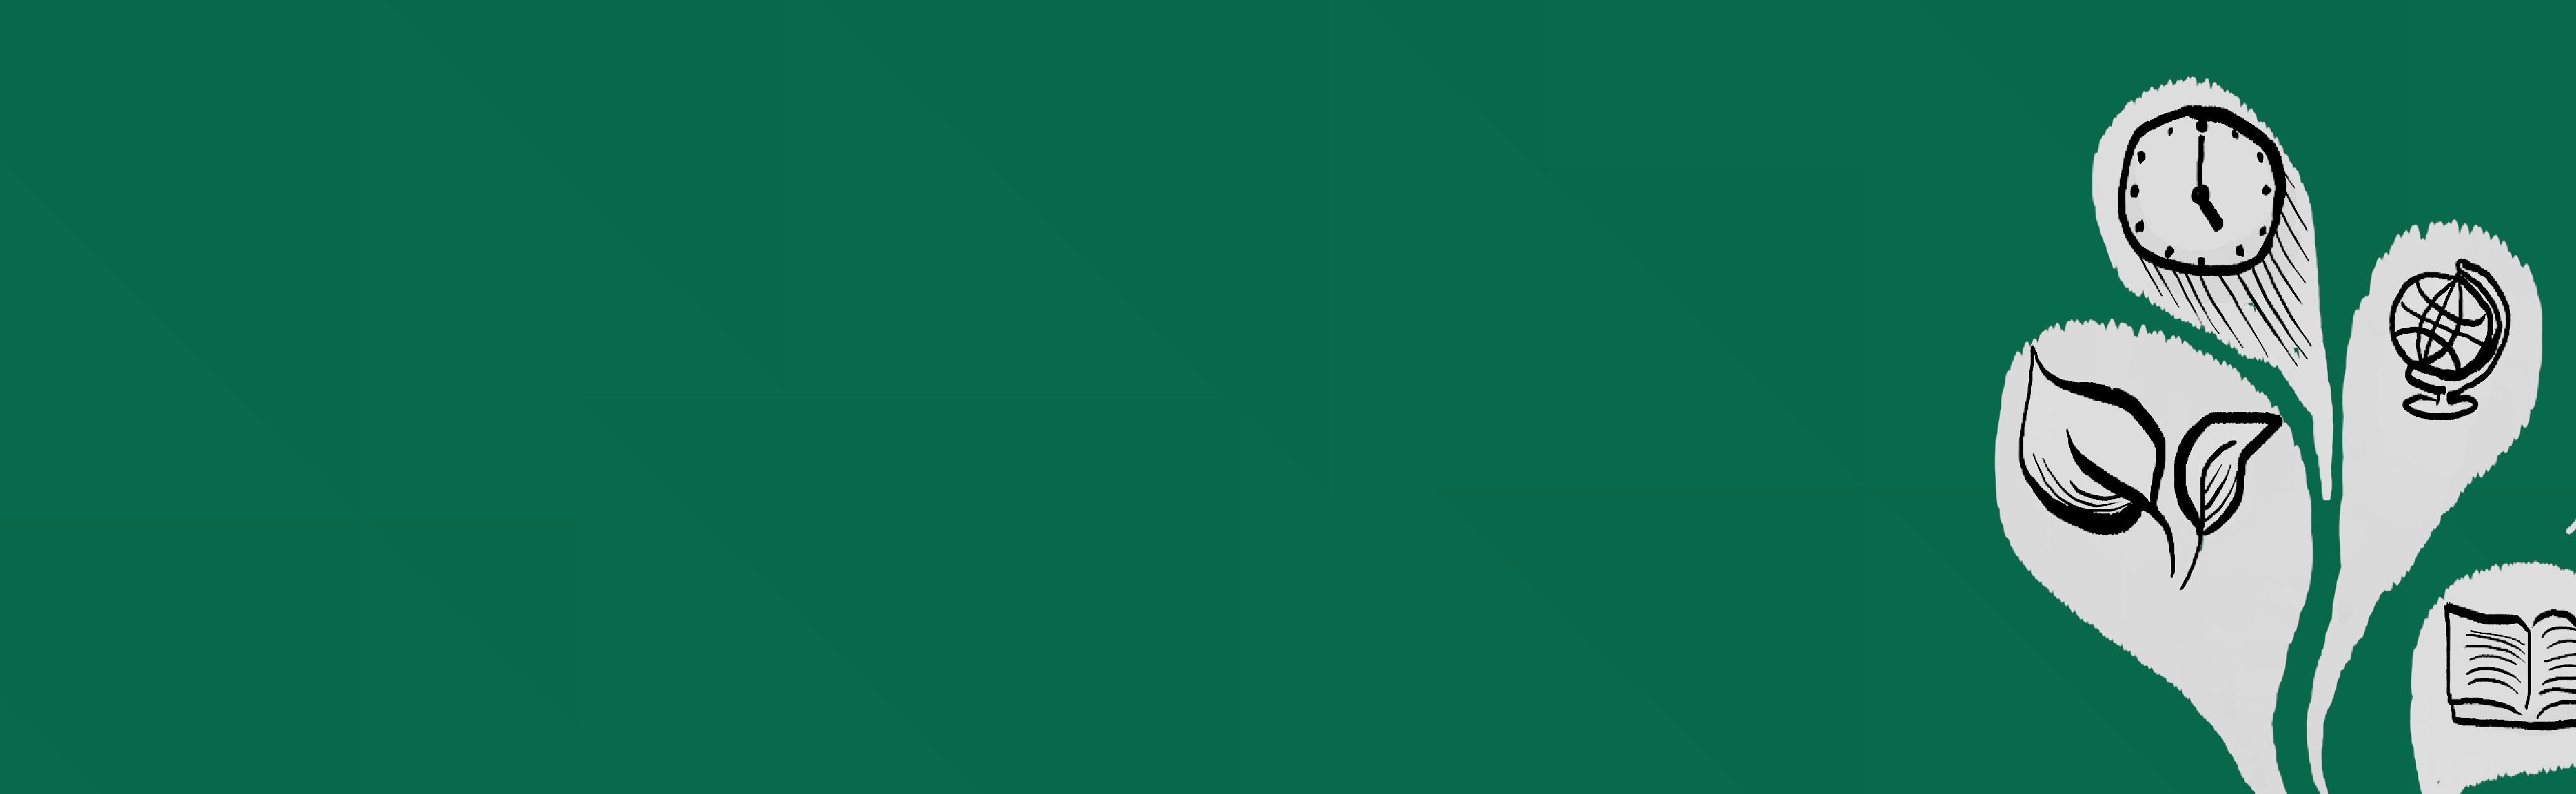 Banners%2bflorestas